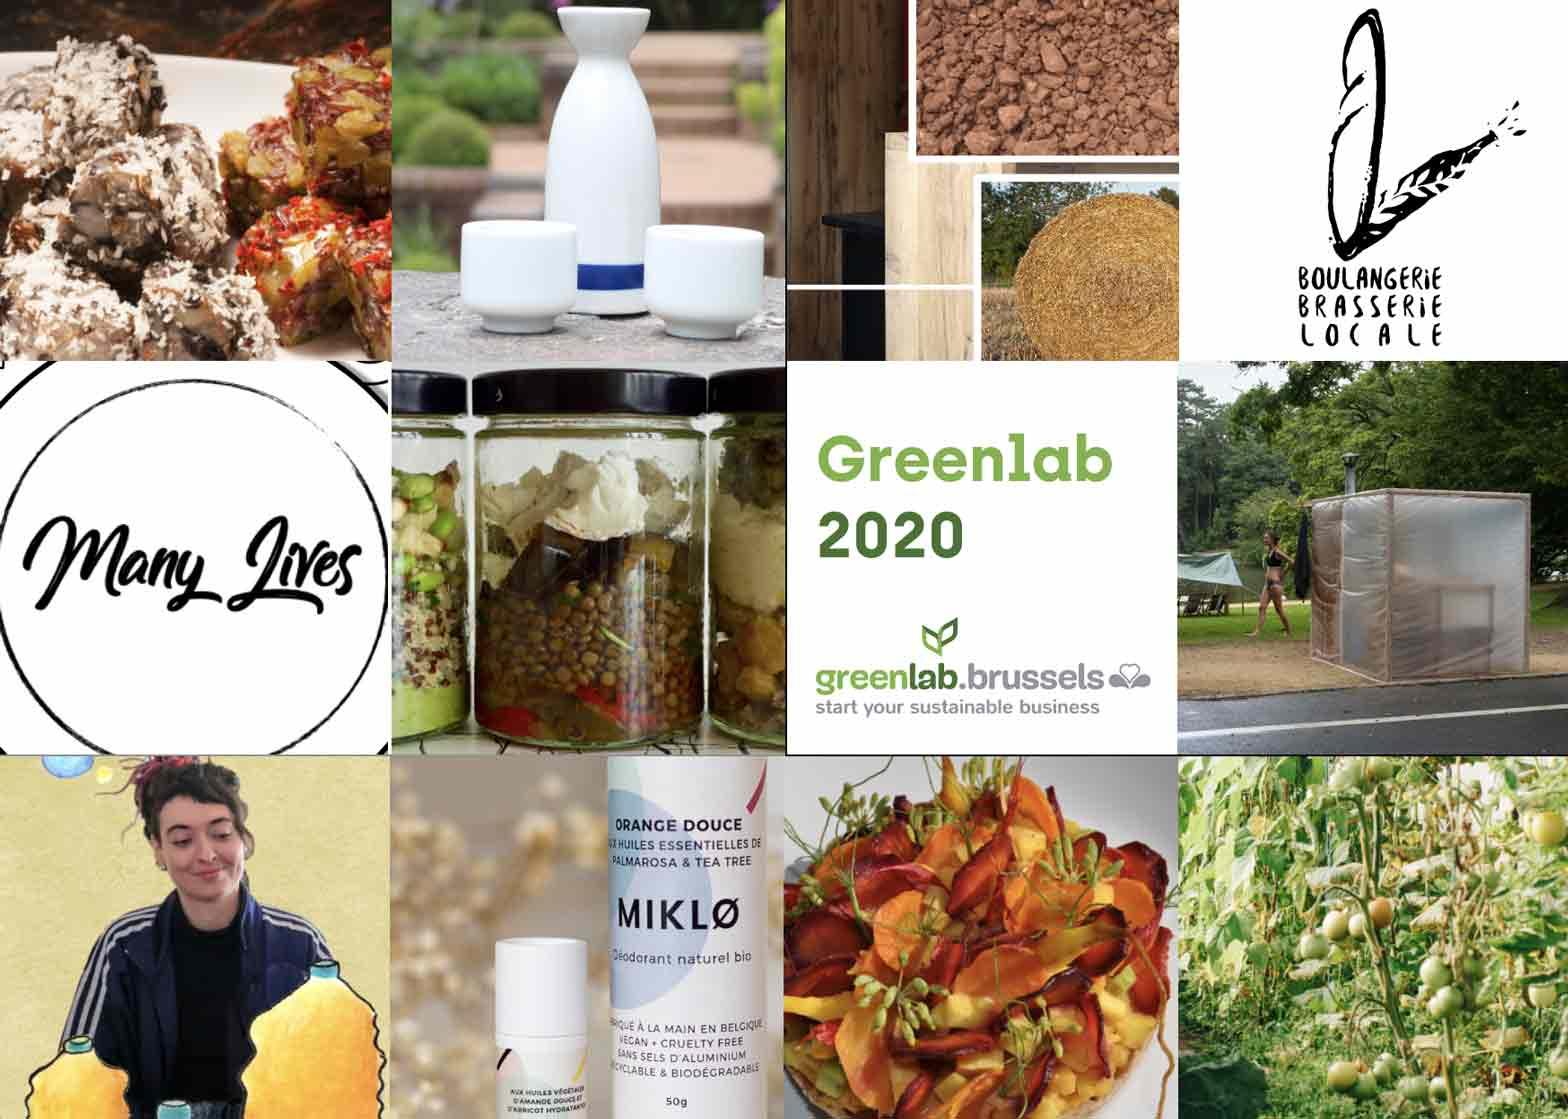 greenlab 2020: les projets gagnants sont connus!